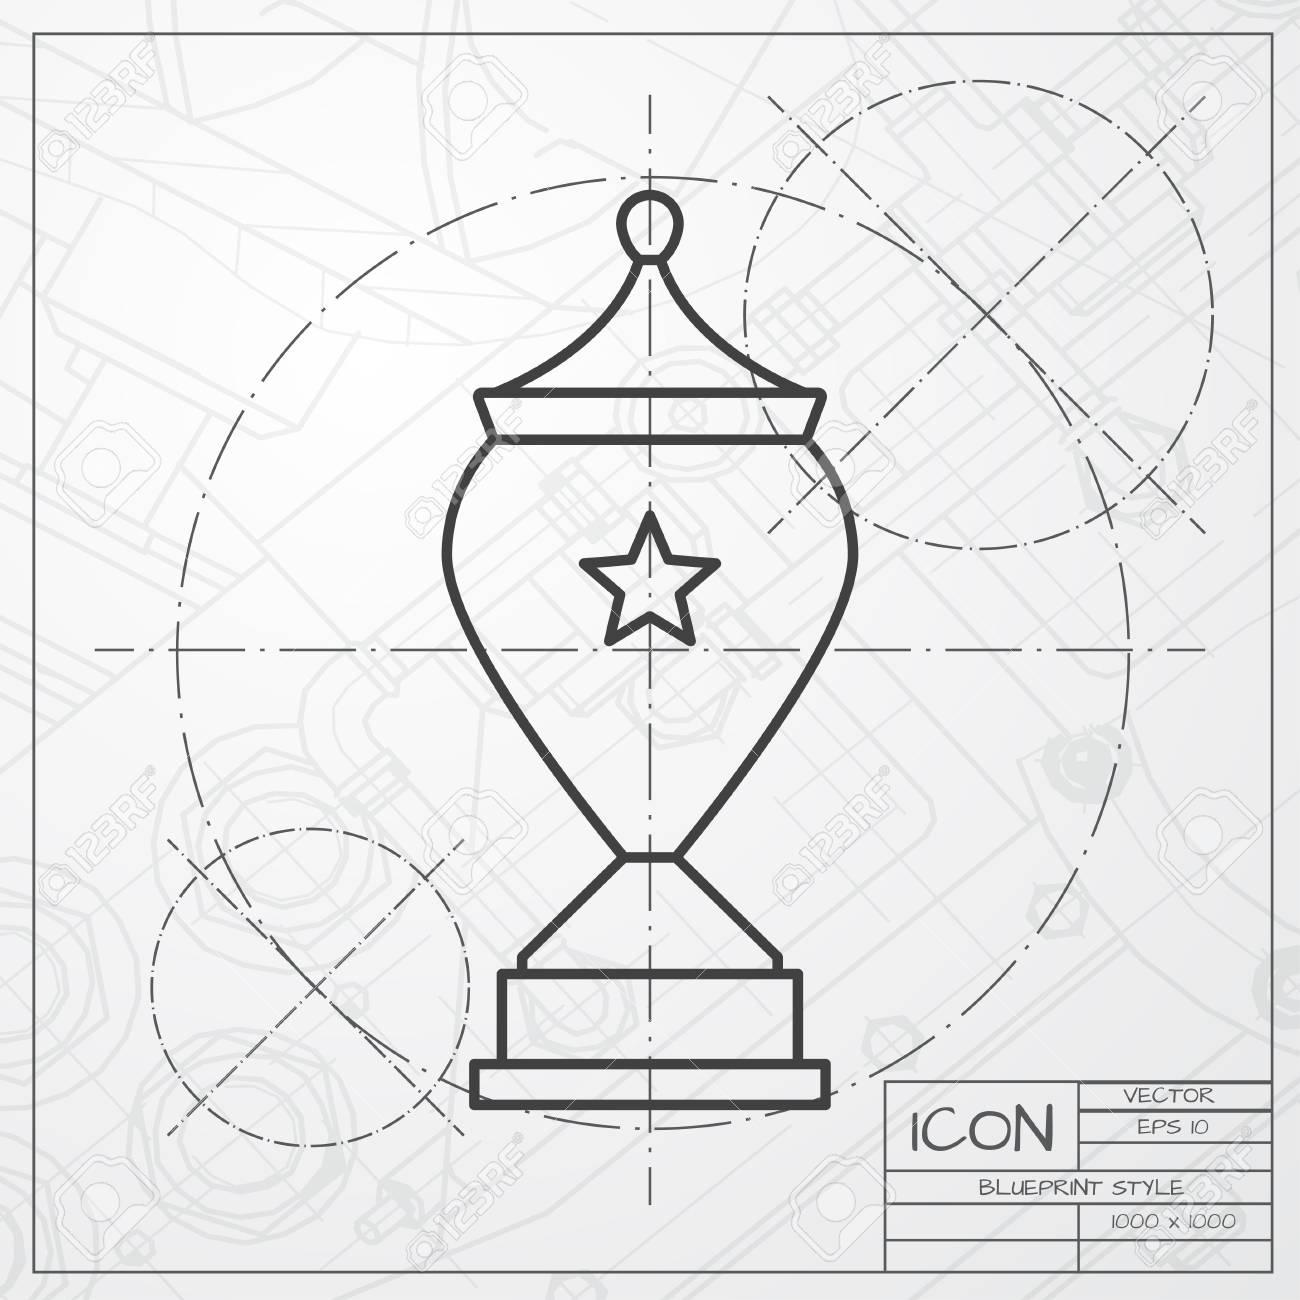 Vector classic blueprint of trophy goblet icon on engineer and vector vector classic blueprint of trophy goblet icon on engineer and architect background winner award malvernweather Gallery